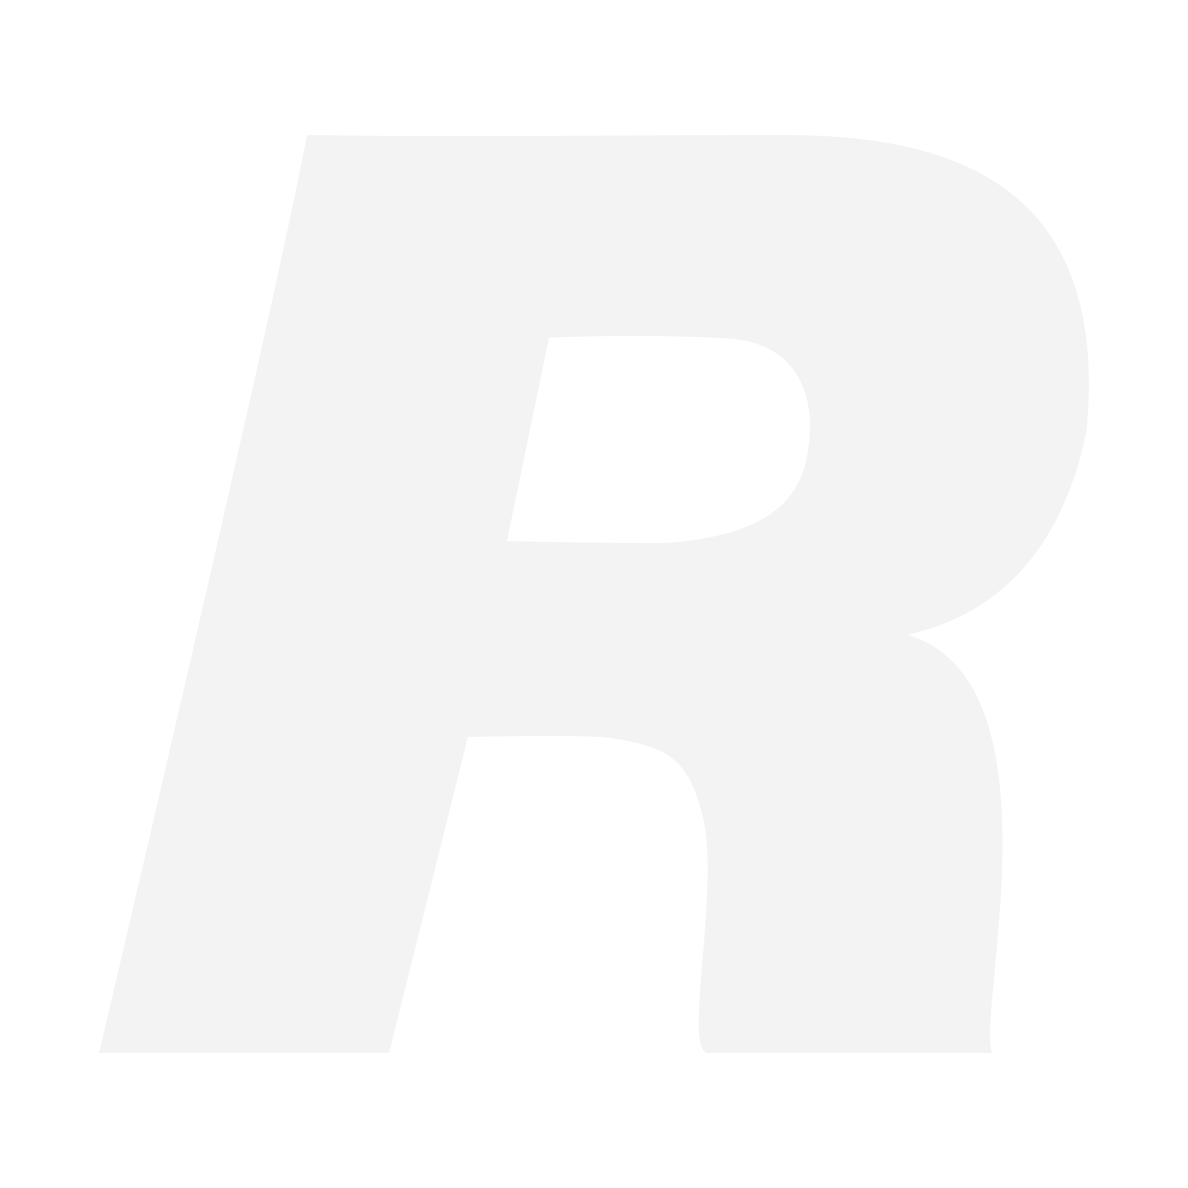 SONY DLC-HEU15 MICROHDMICABLE 1,5M